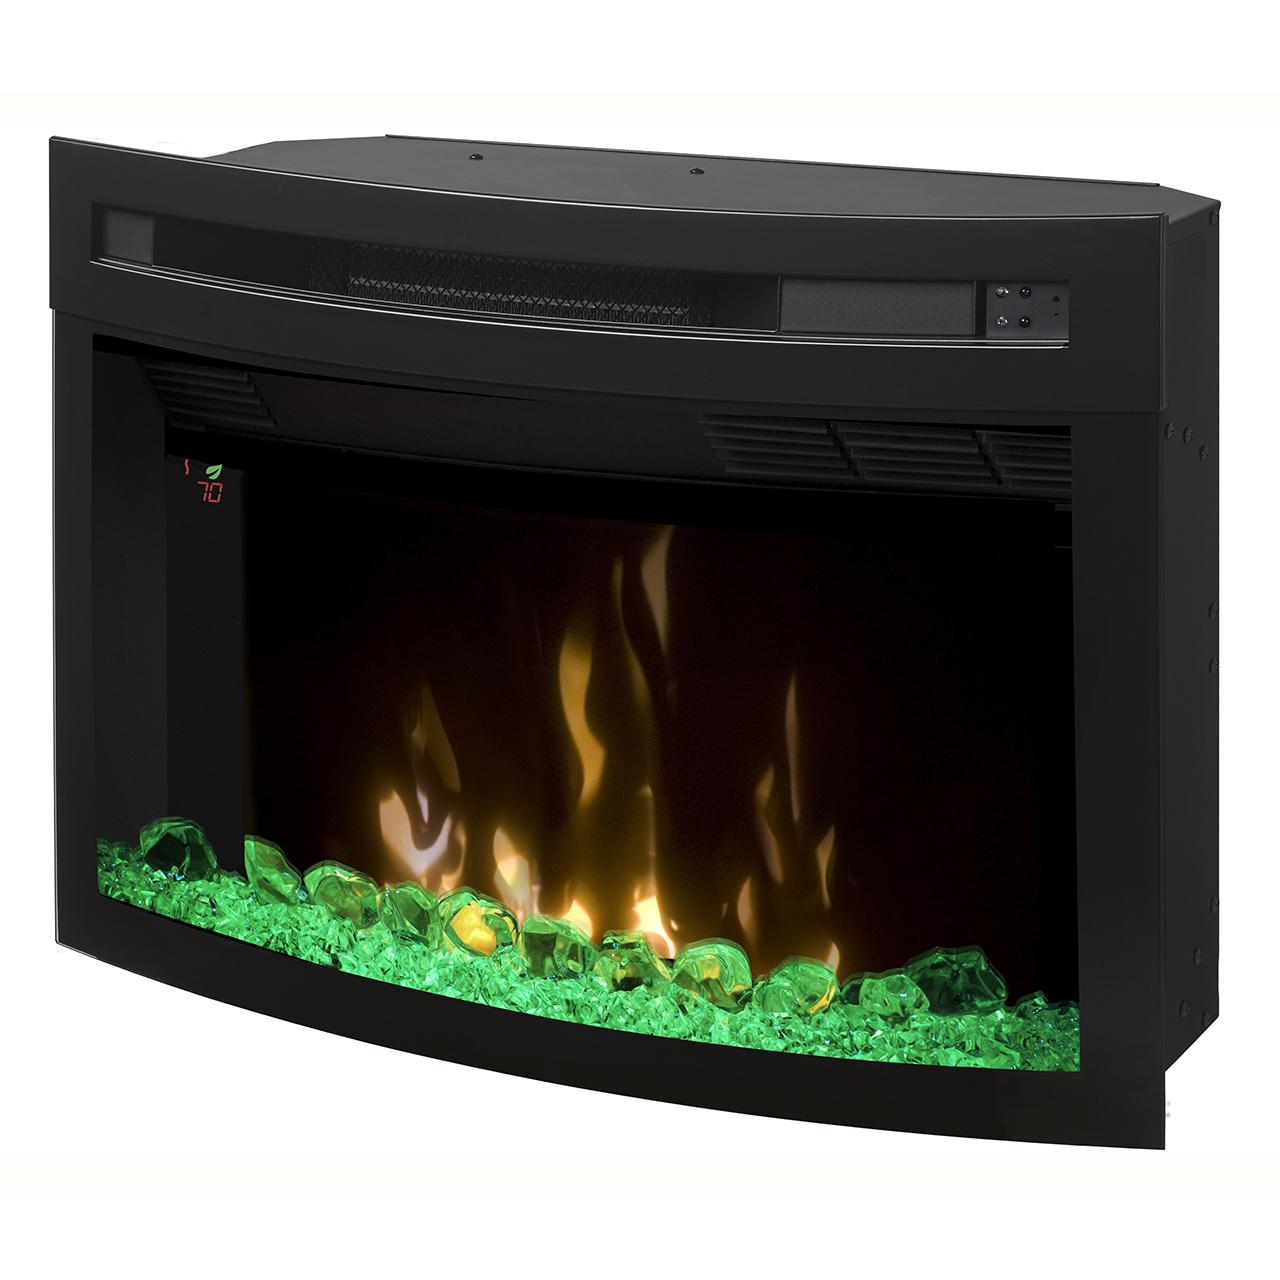 Dimplex 25 Multi Fire Xd Electric Firebox Pf Cg